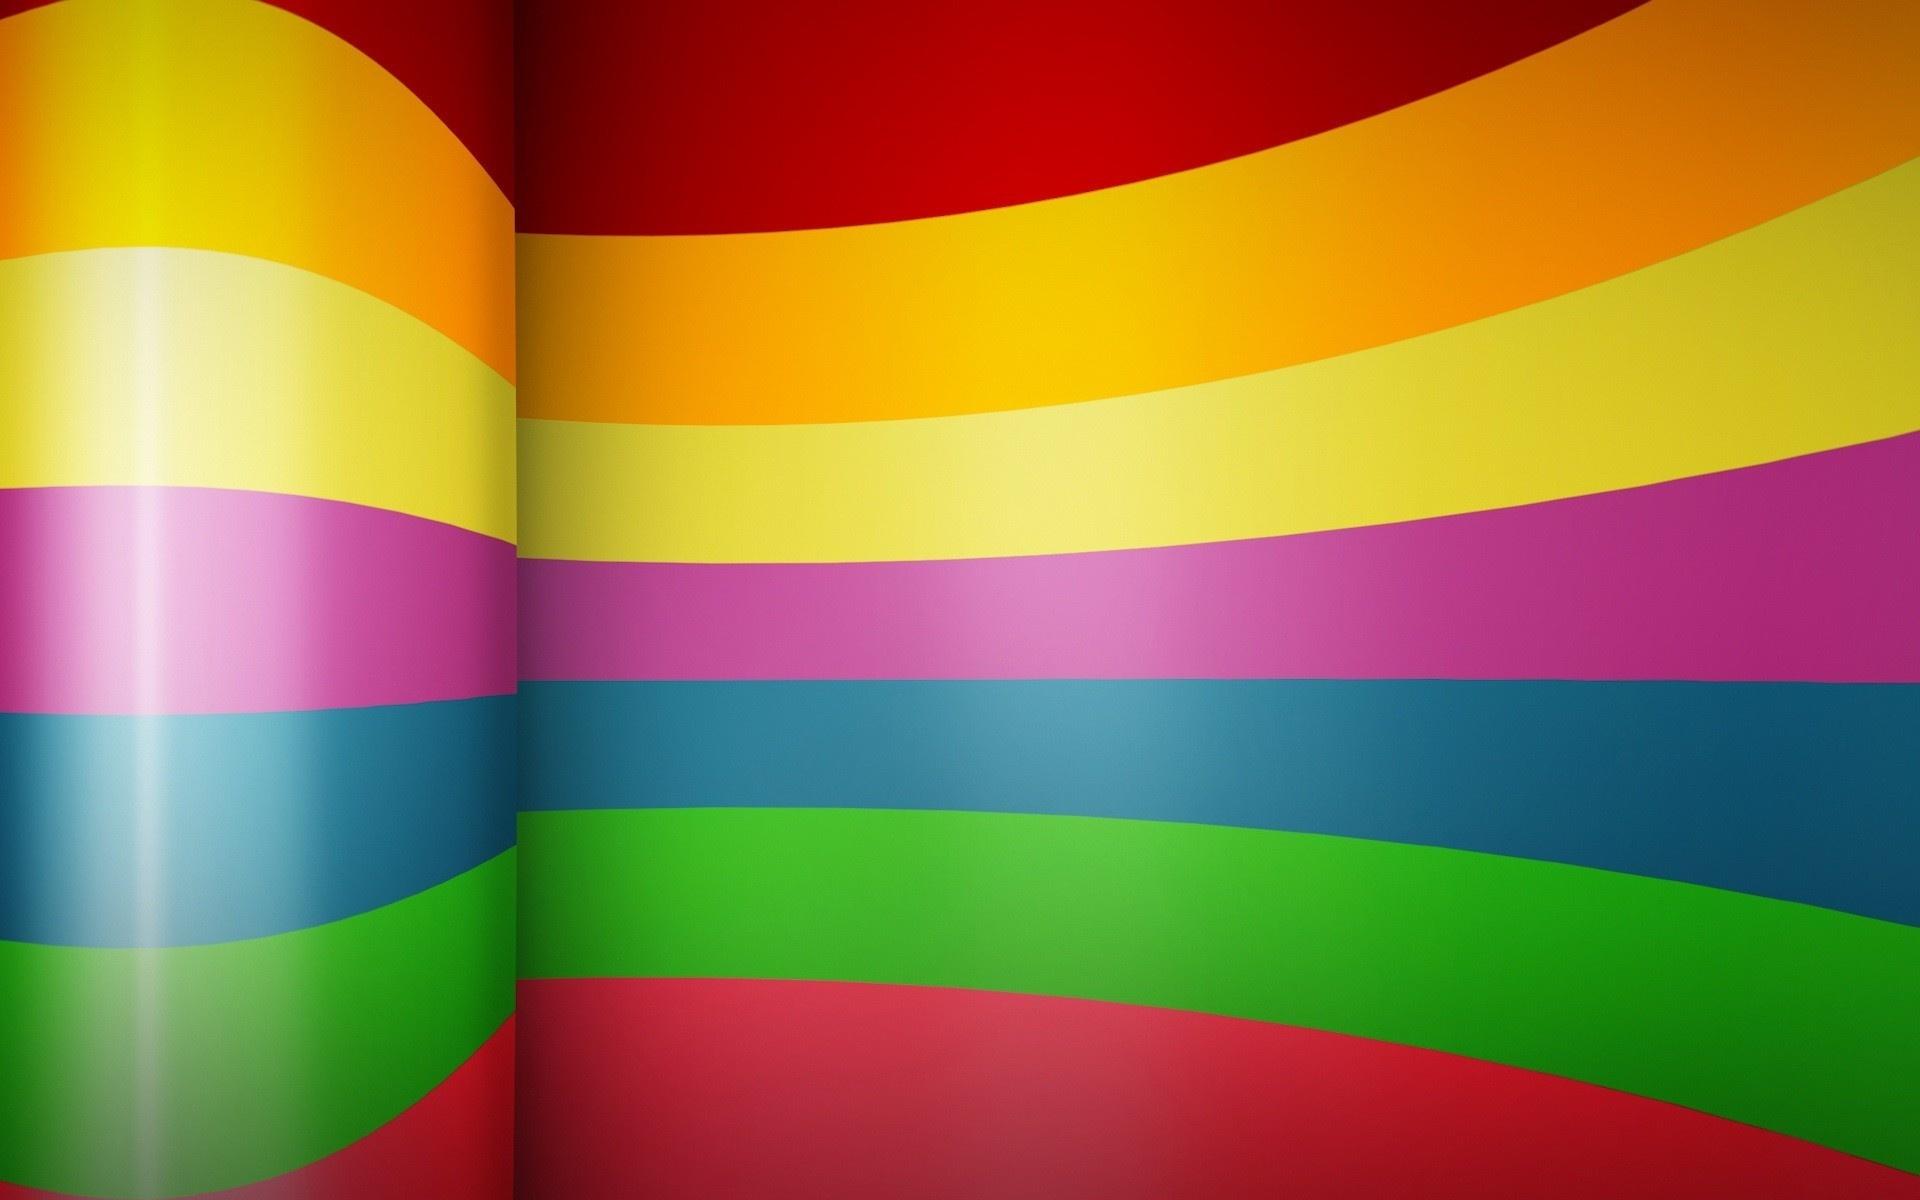 картинки яркие цвета: